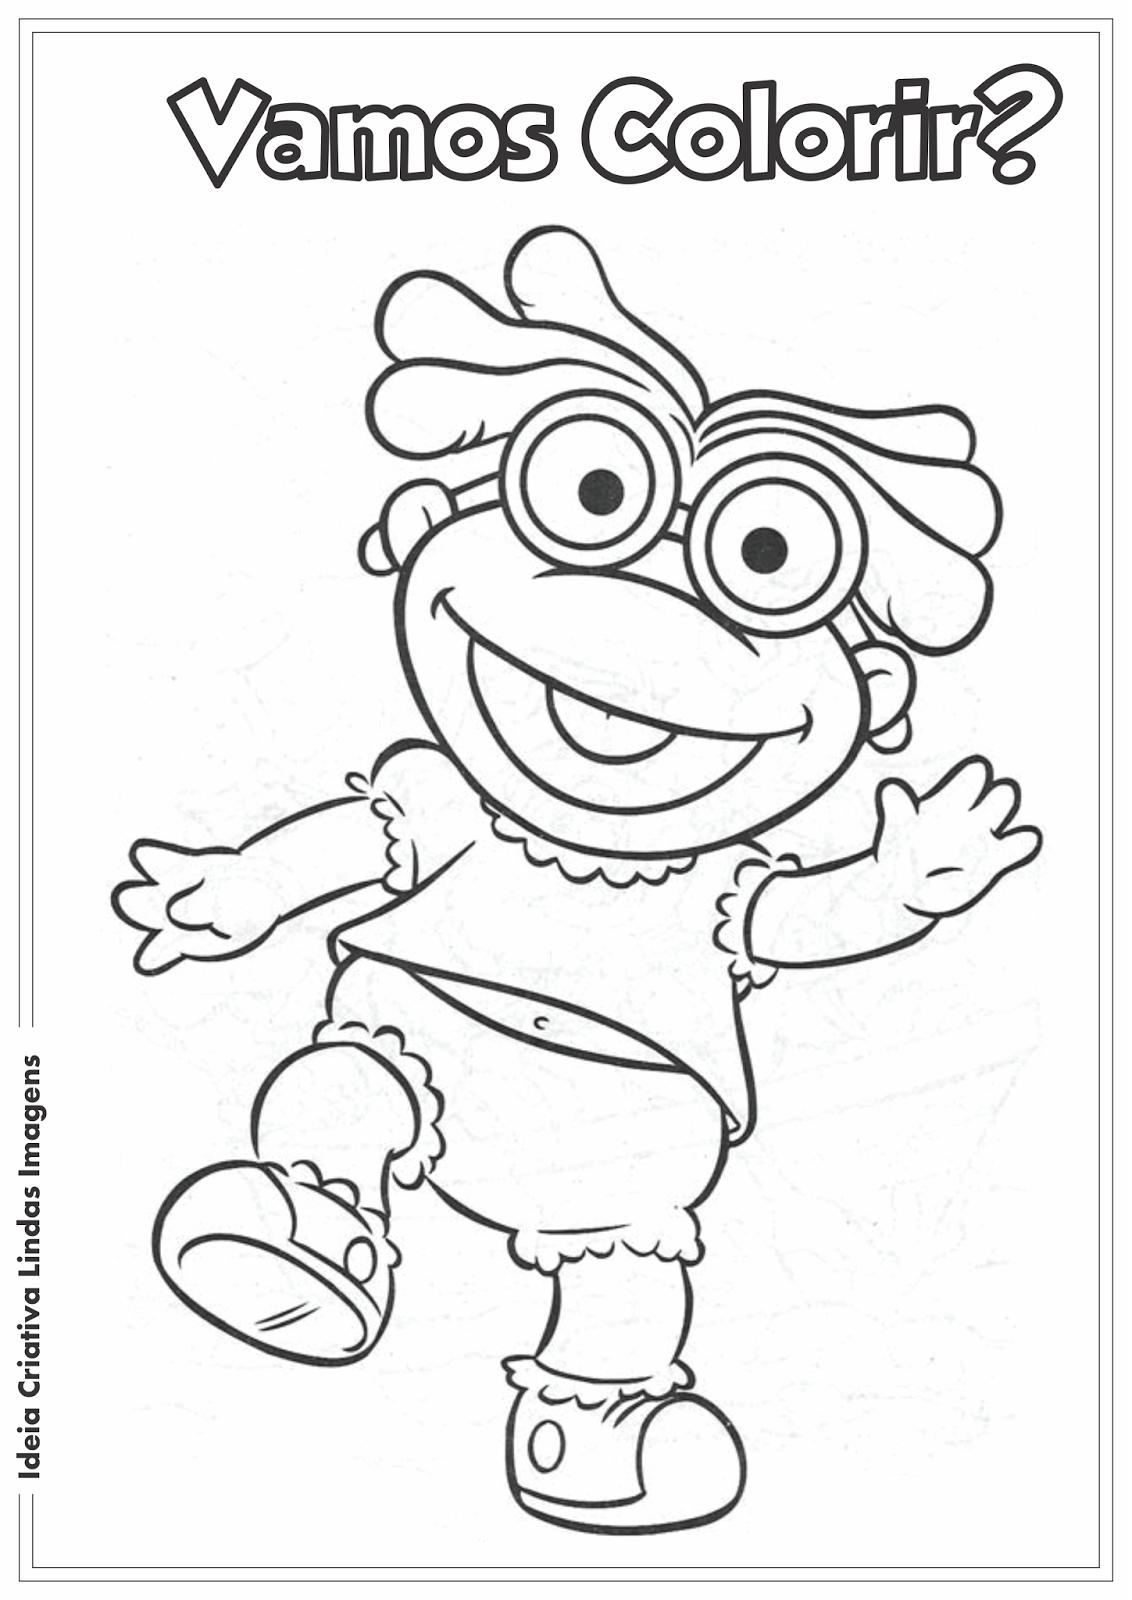 Desenho pra colorir - Os Muppets bebês